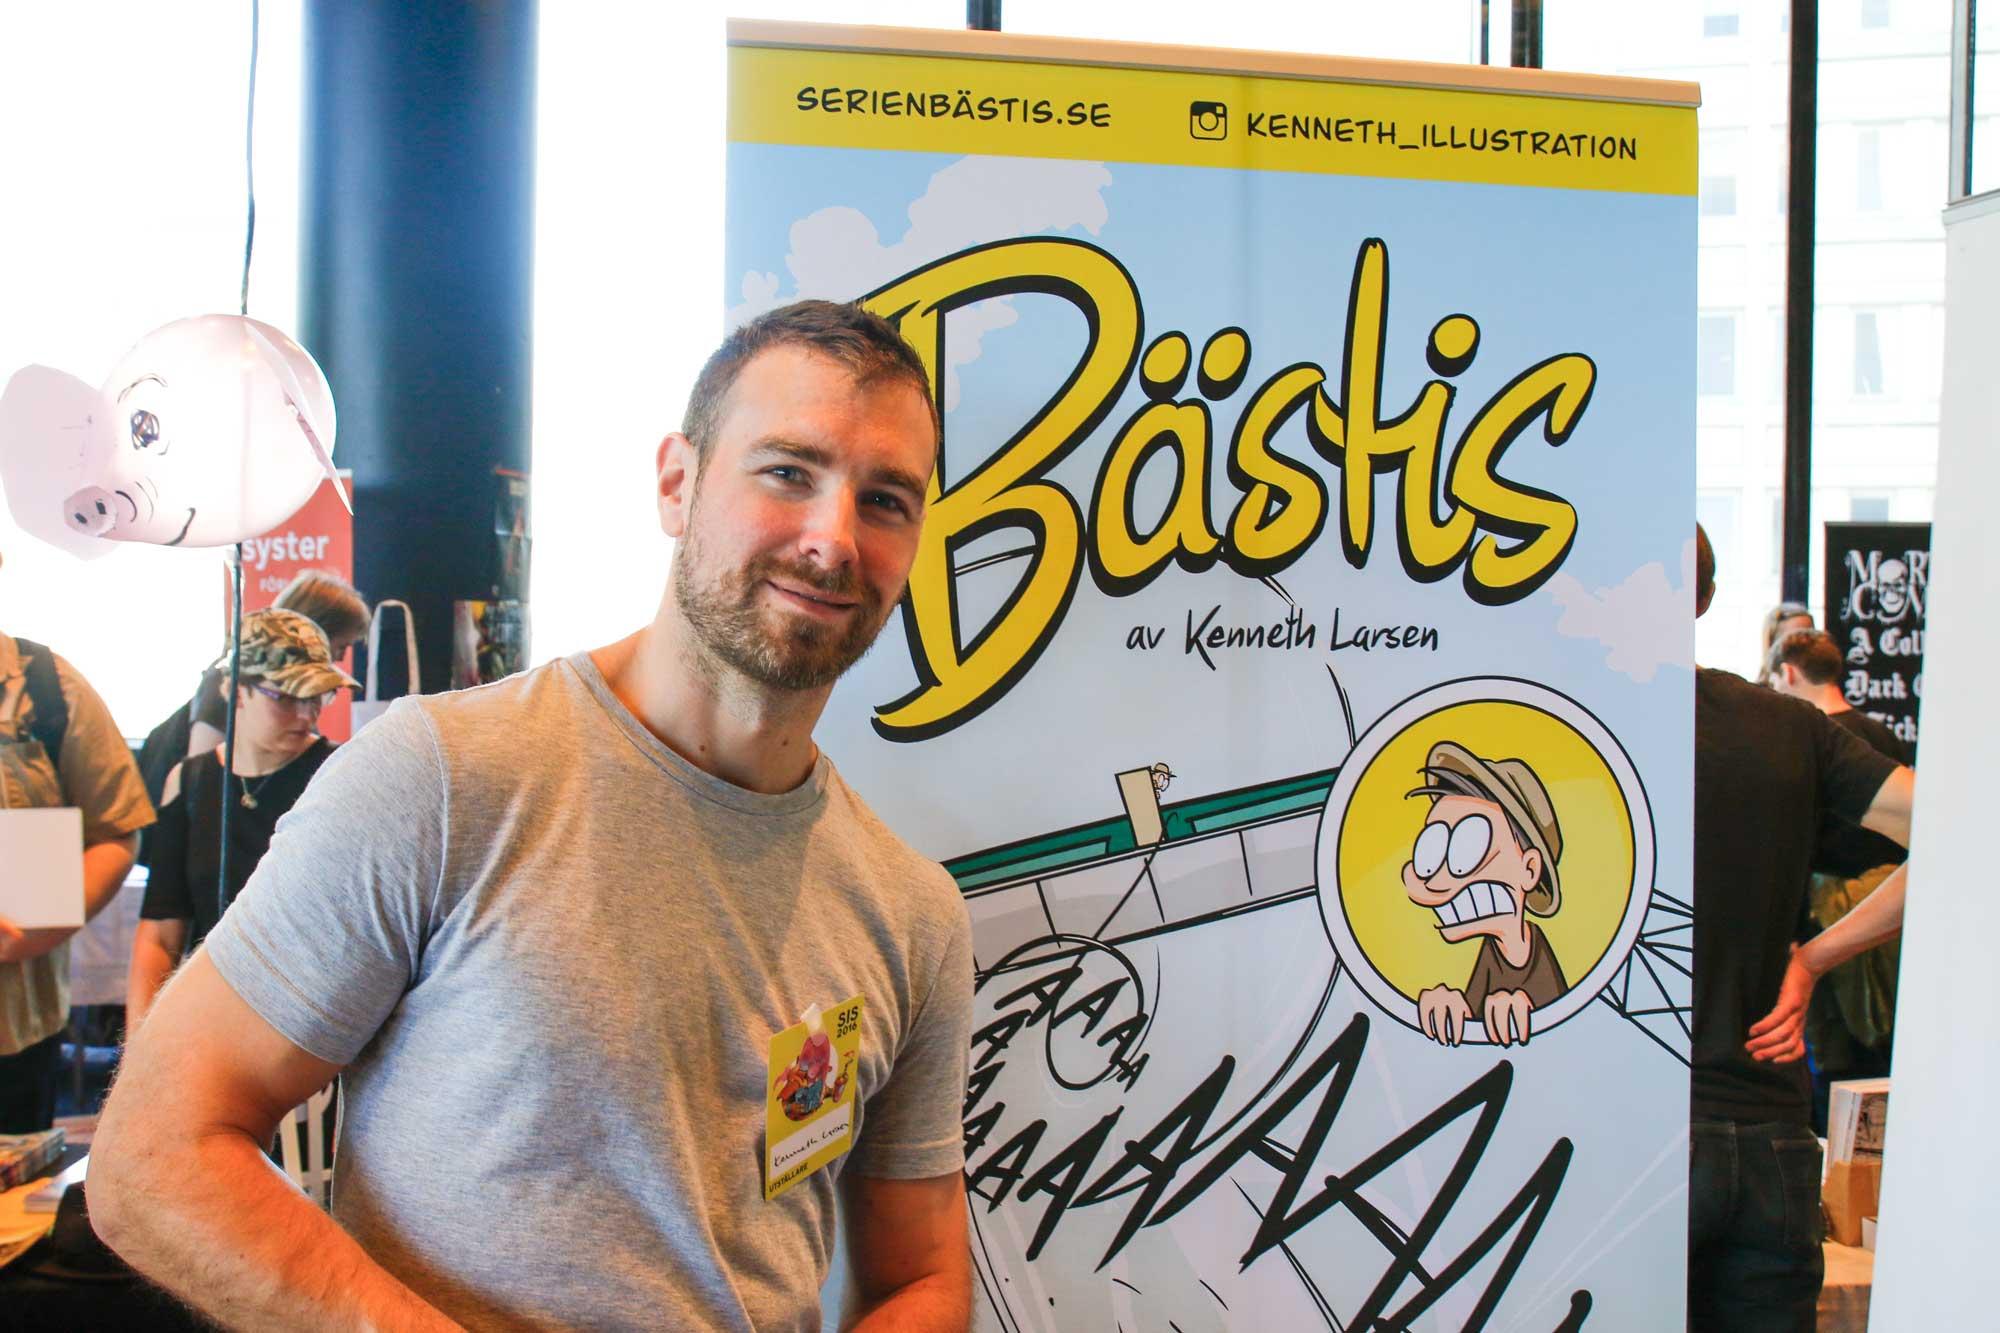 Bestis, Kenneth Larsen, Stockholms Internationelle Seriefestival.